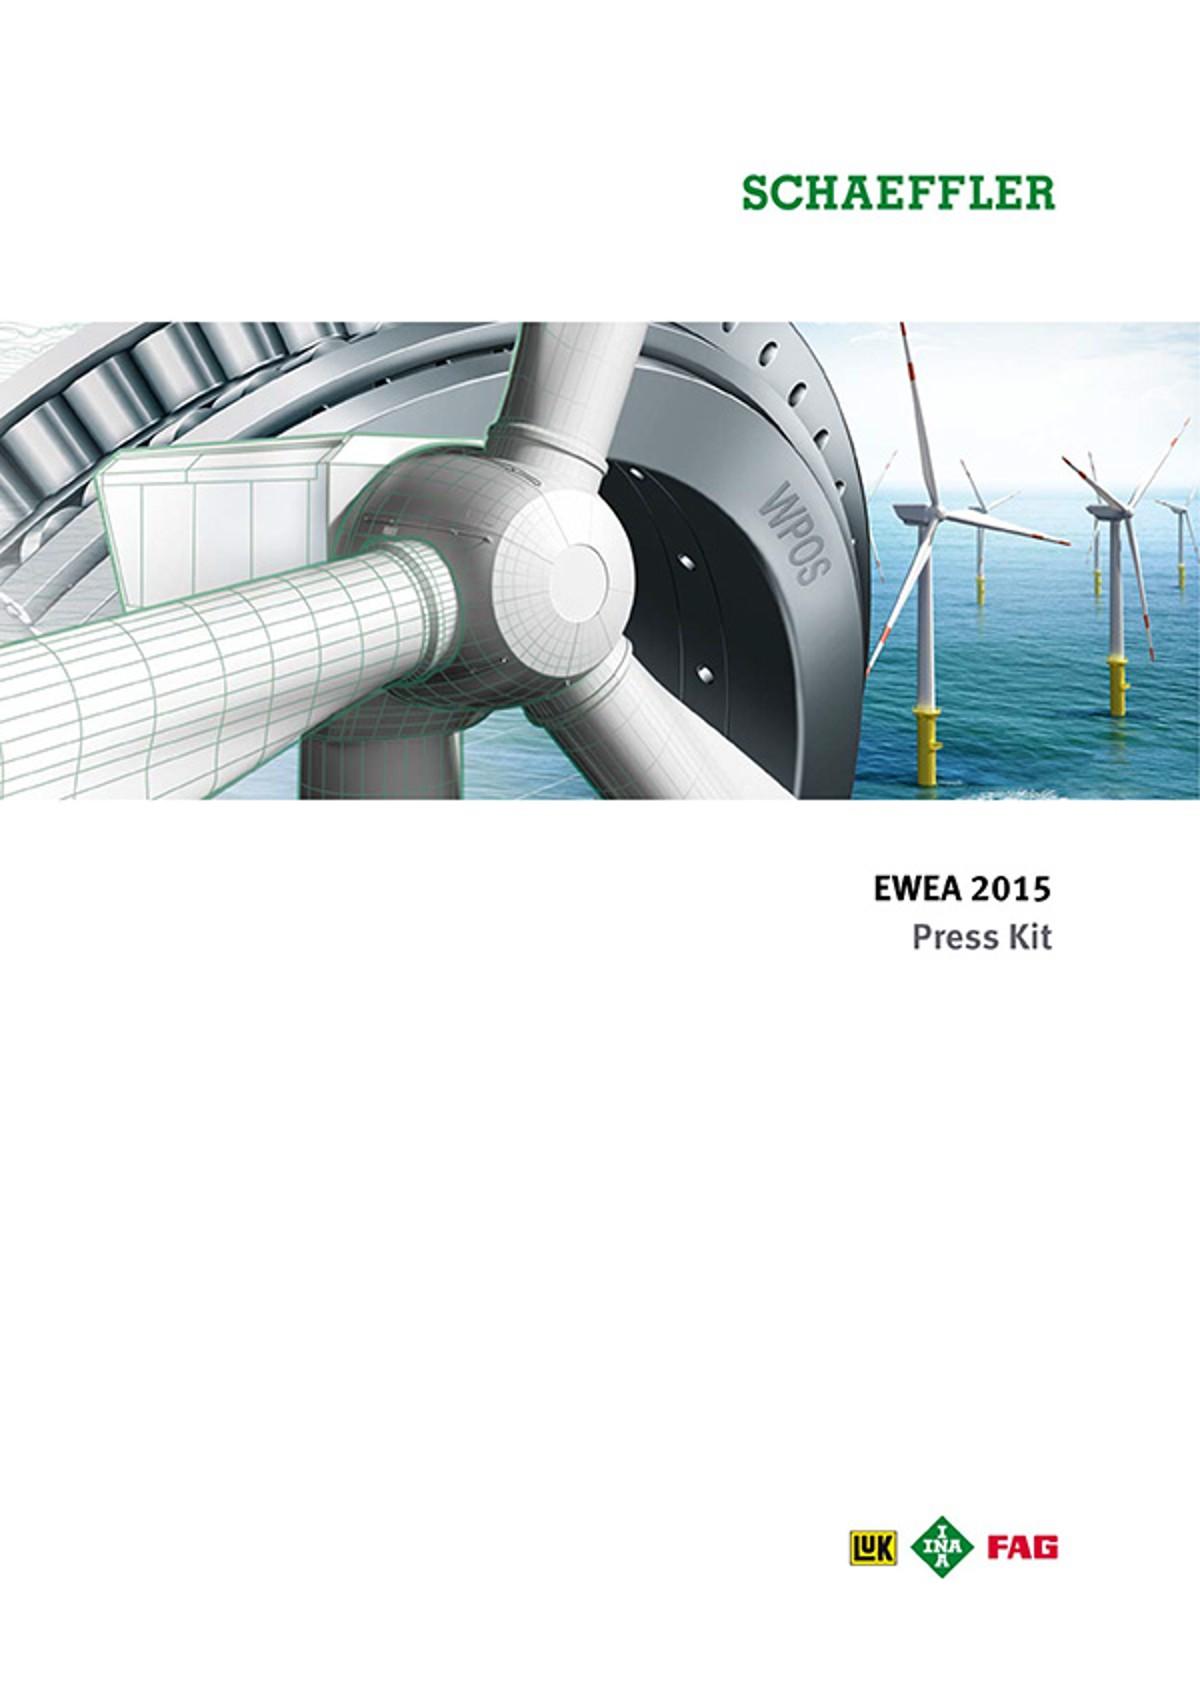 EWEA 2015 Schaeffler Press Kit